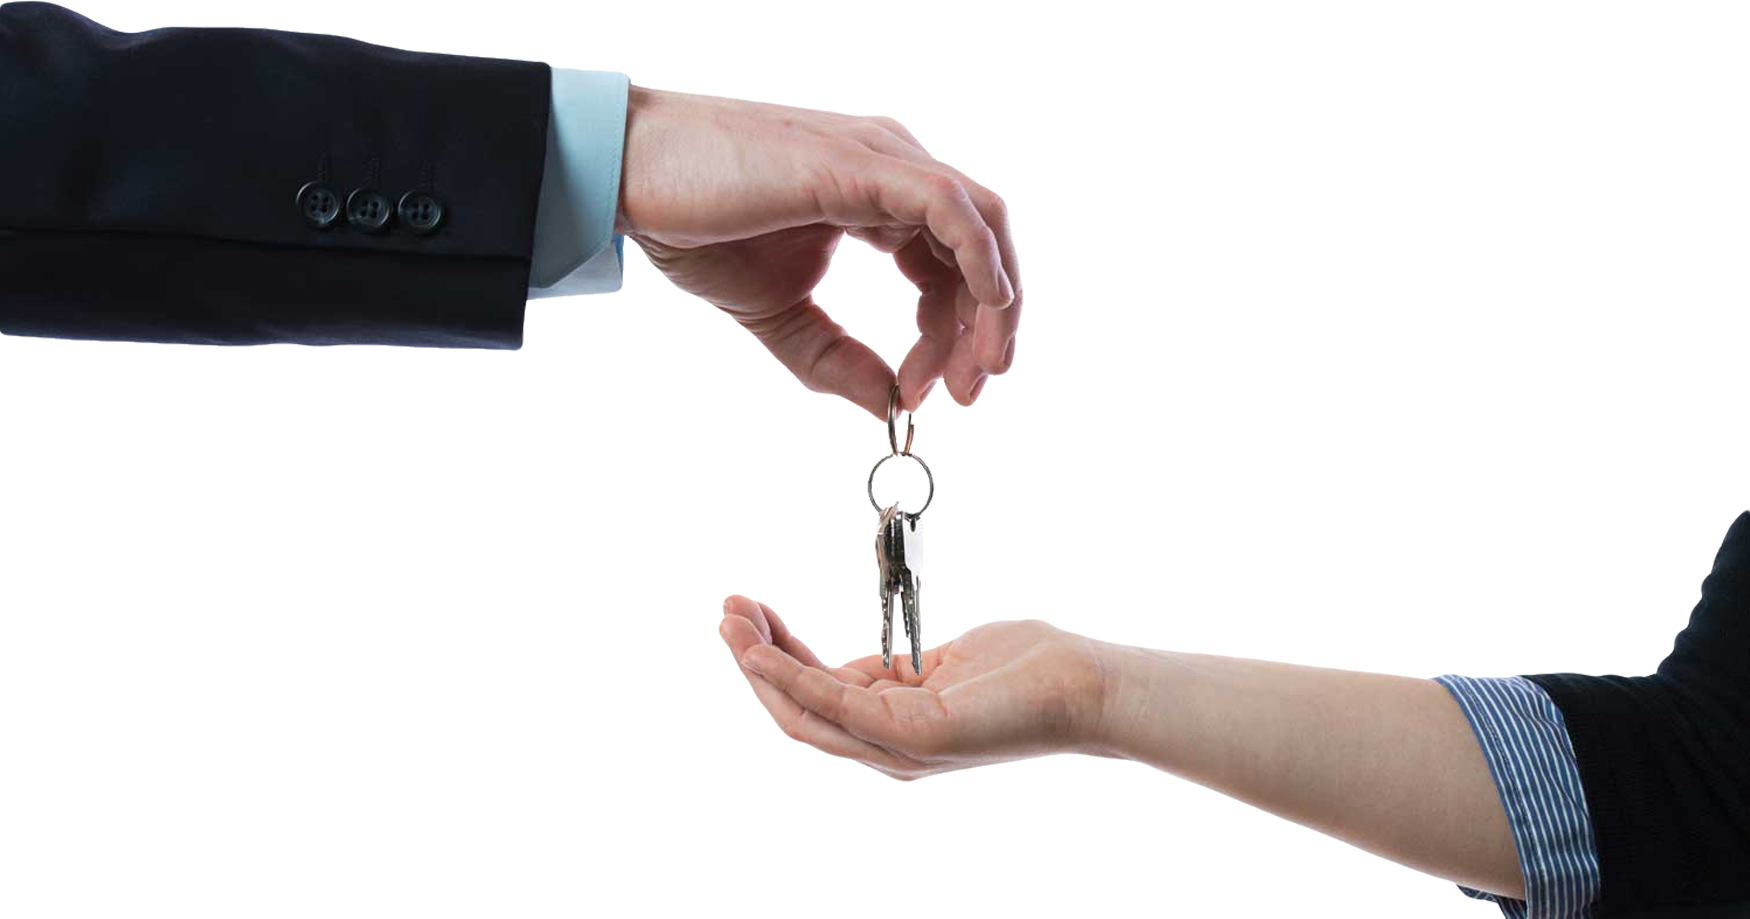 Png images transparent free. Clipart house keys